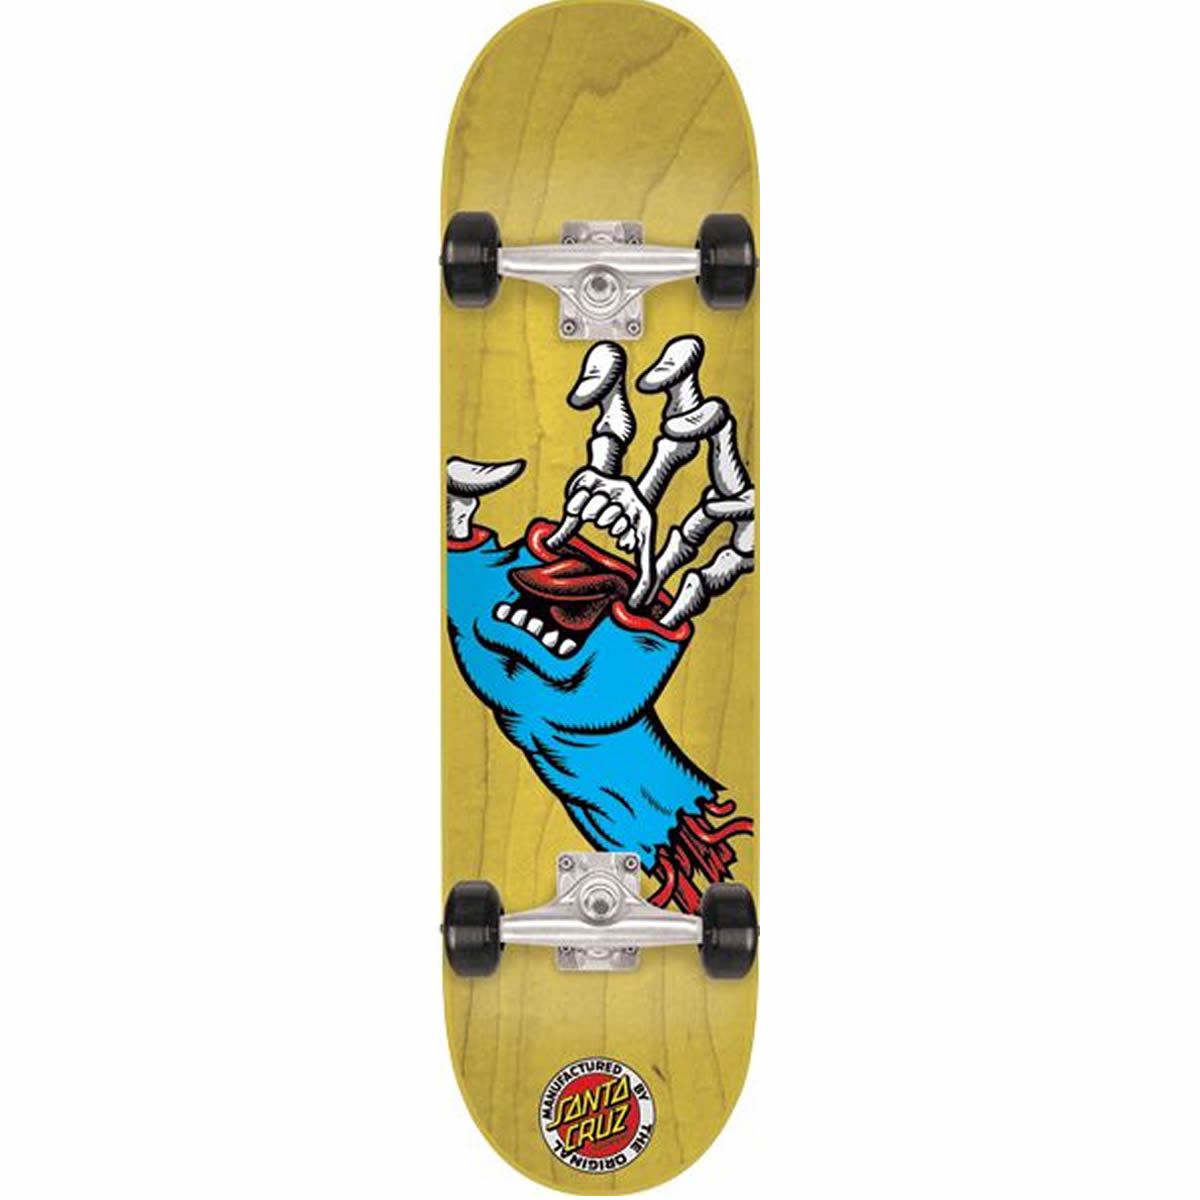 Santa Cruz Hybrid Hand - Natural/Blue - 6.75in x 28.5in - Complete Skateboard